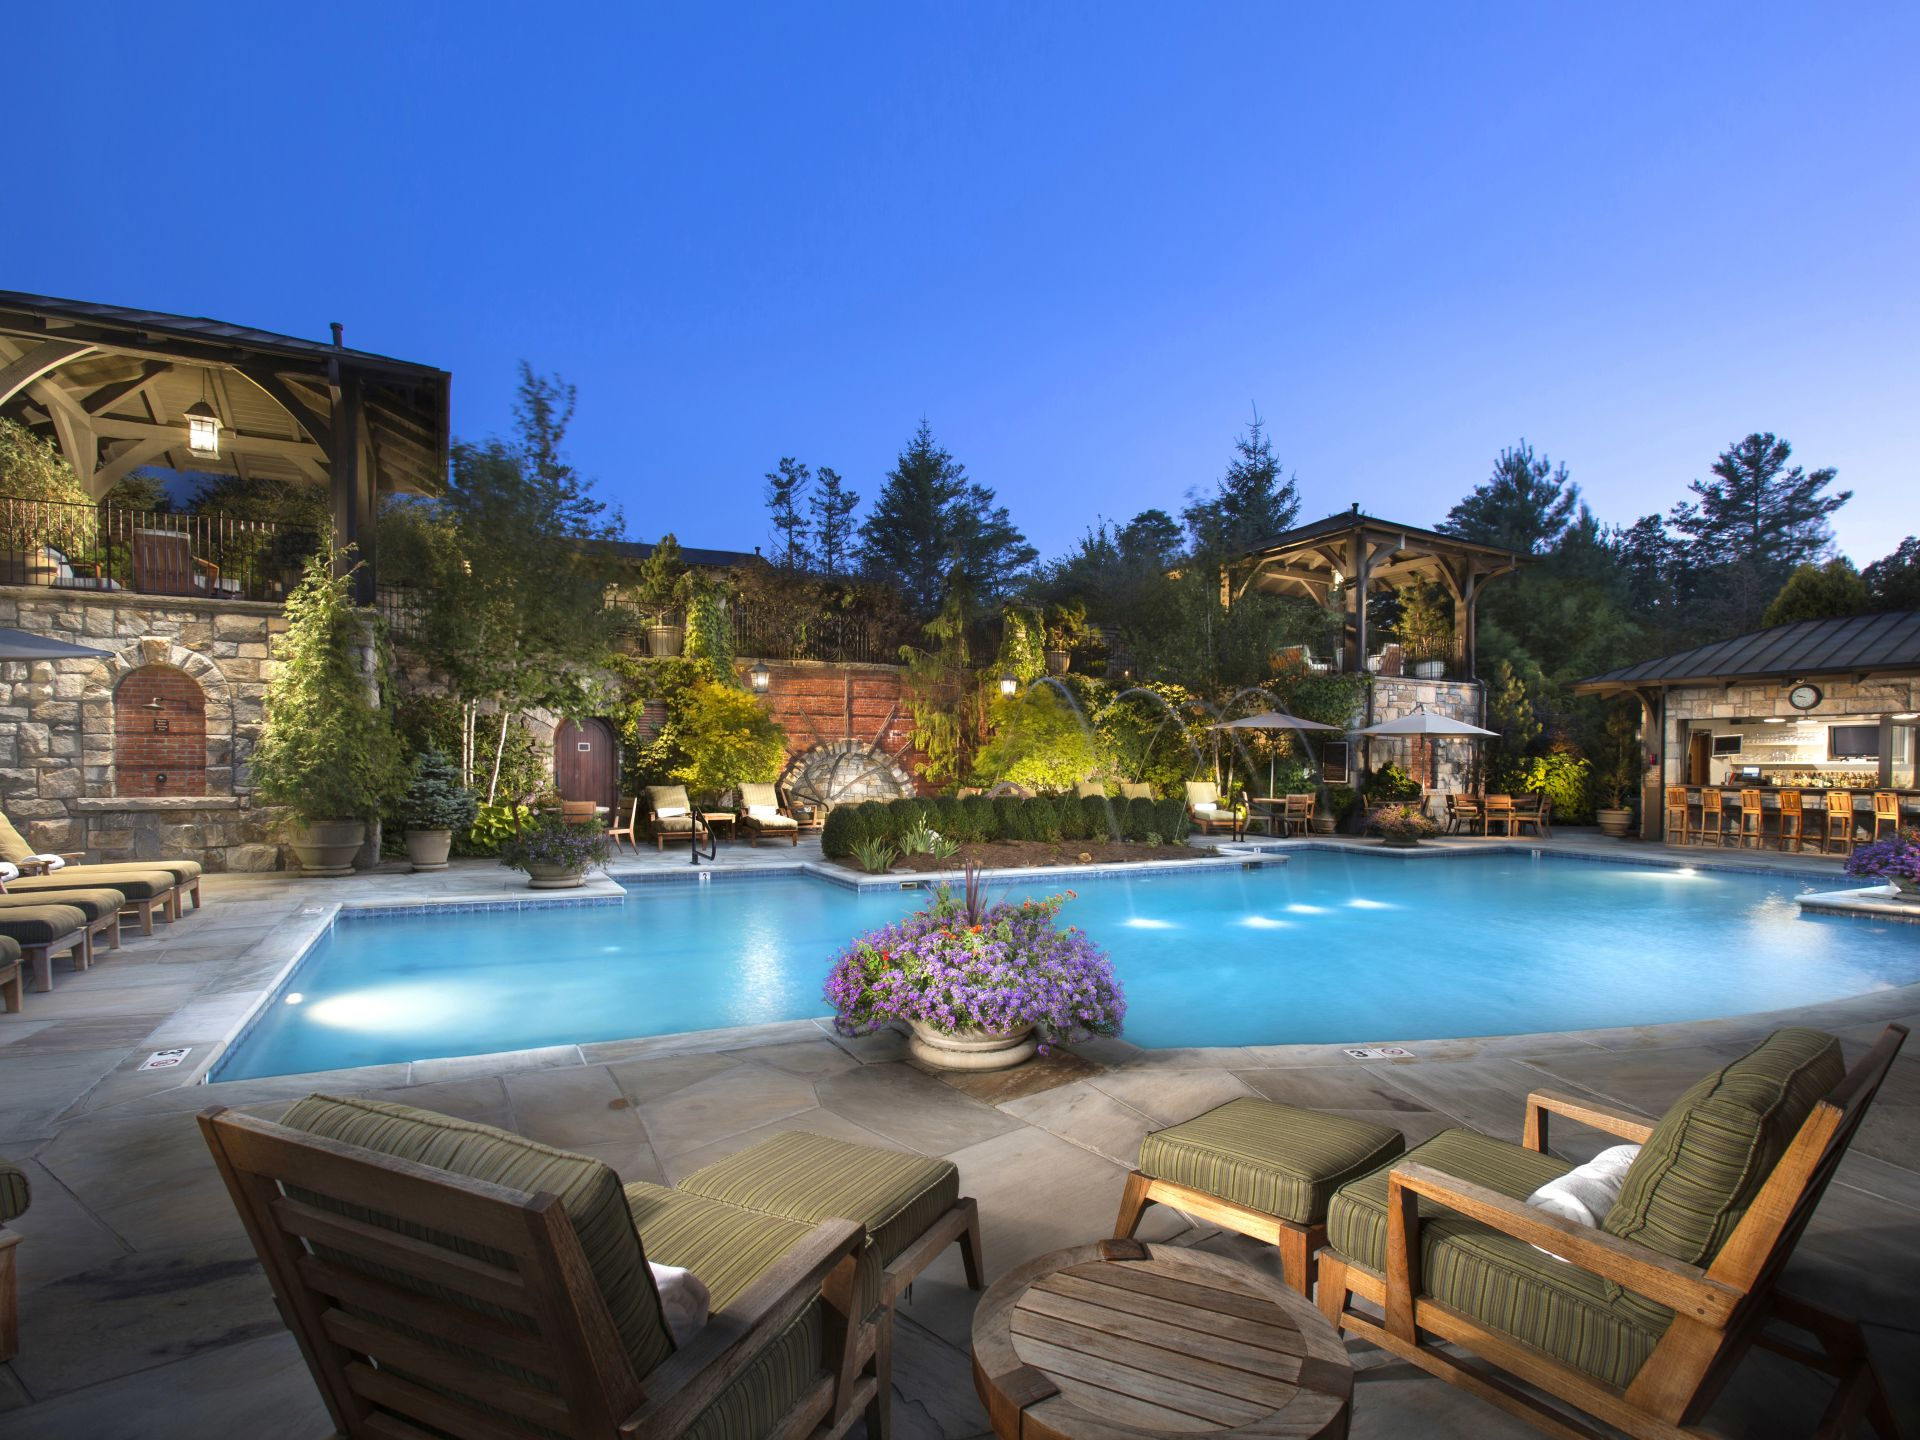 Luxury Country Inn In Highlands Nc Half Mile Farm